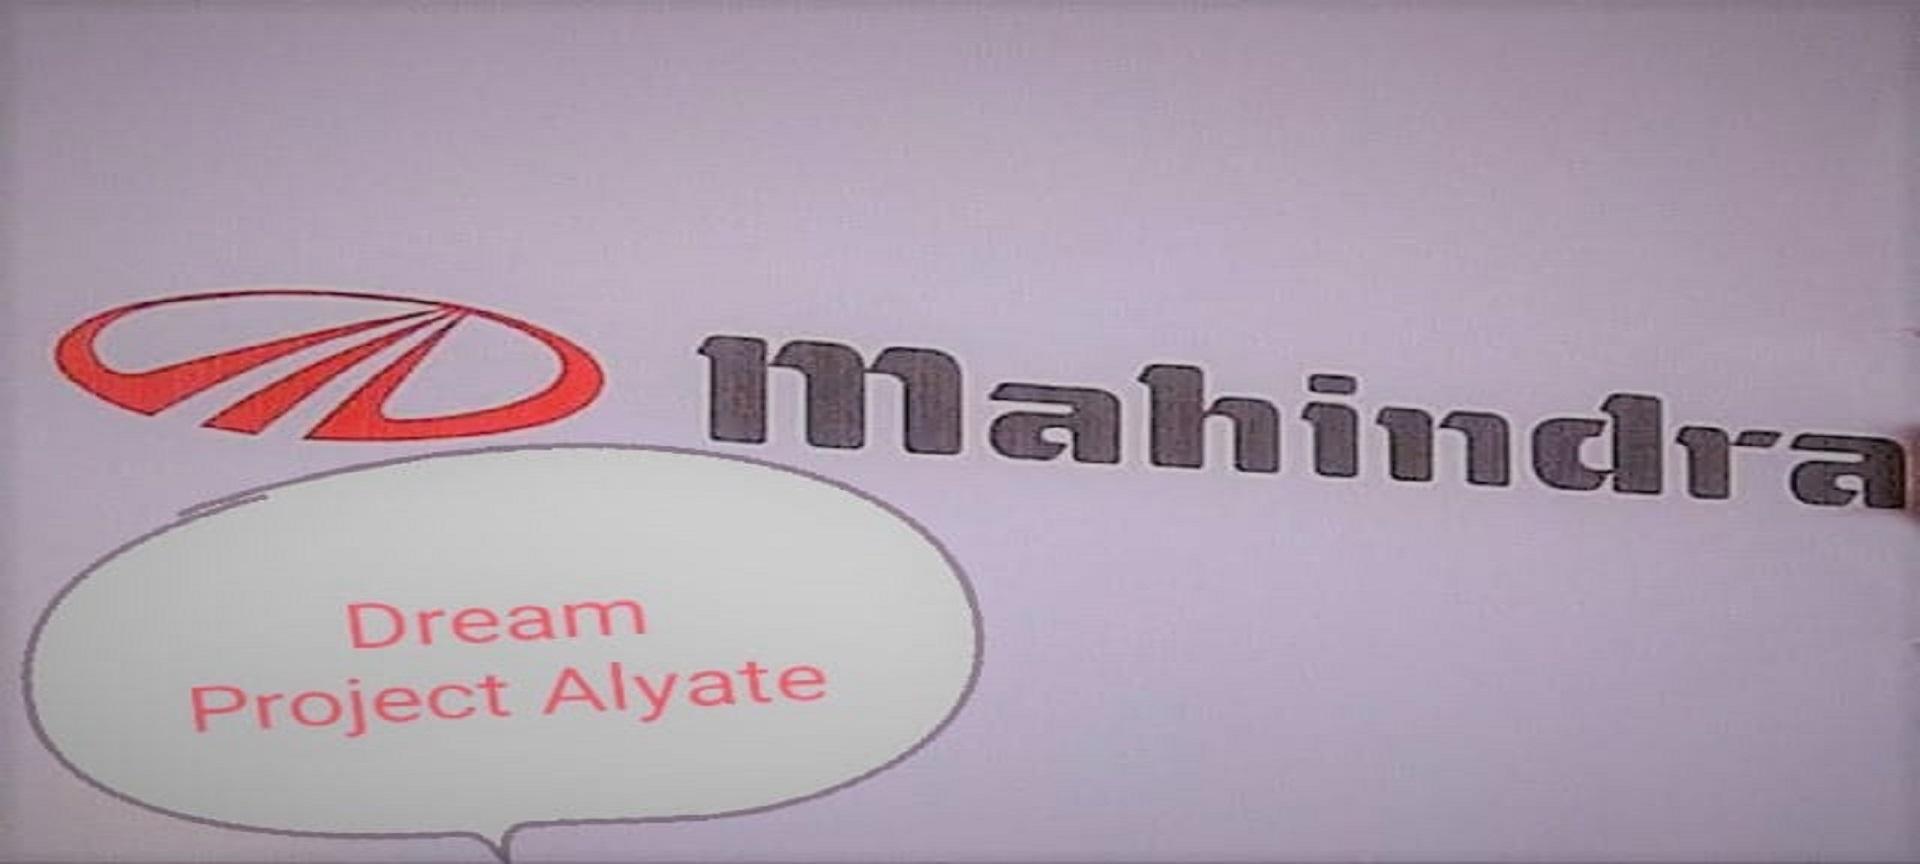 Mahindra automobiles company : new upcoming project Alyate